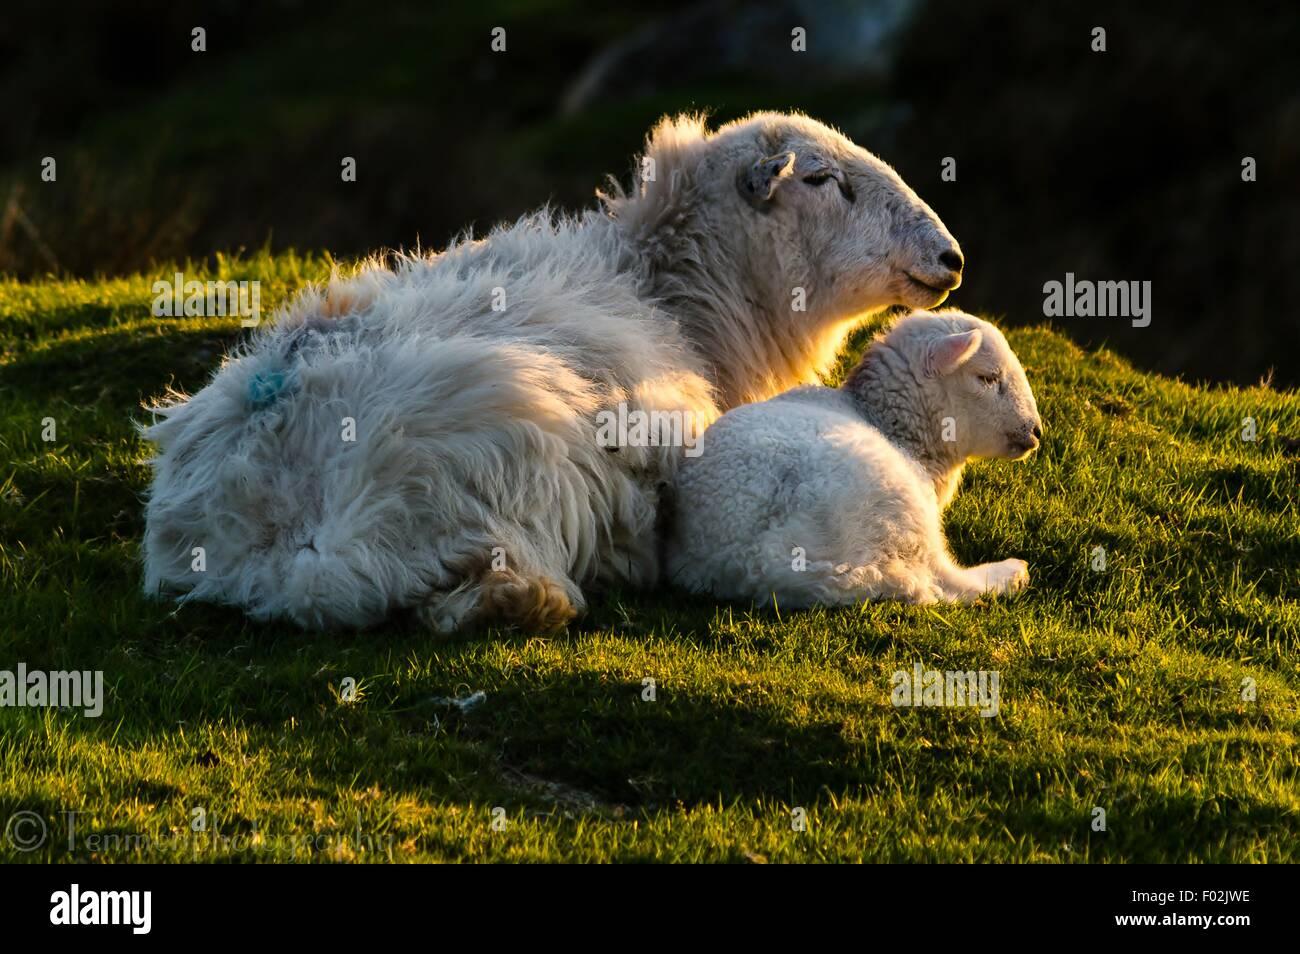 Ewe and Lamb at Sunset - Stock Image